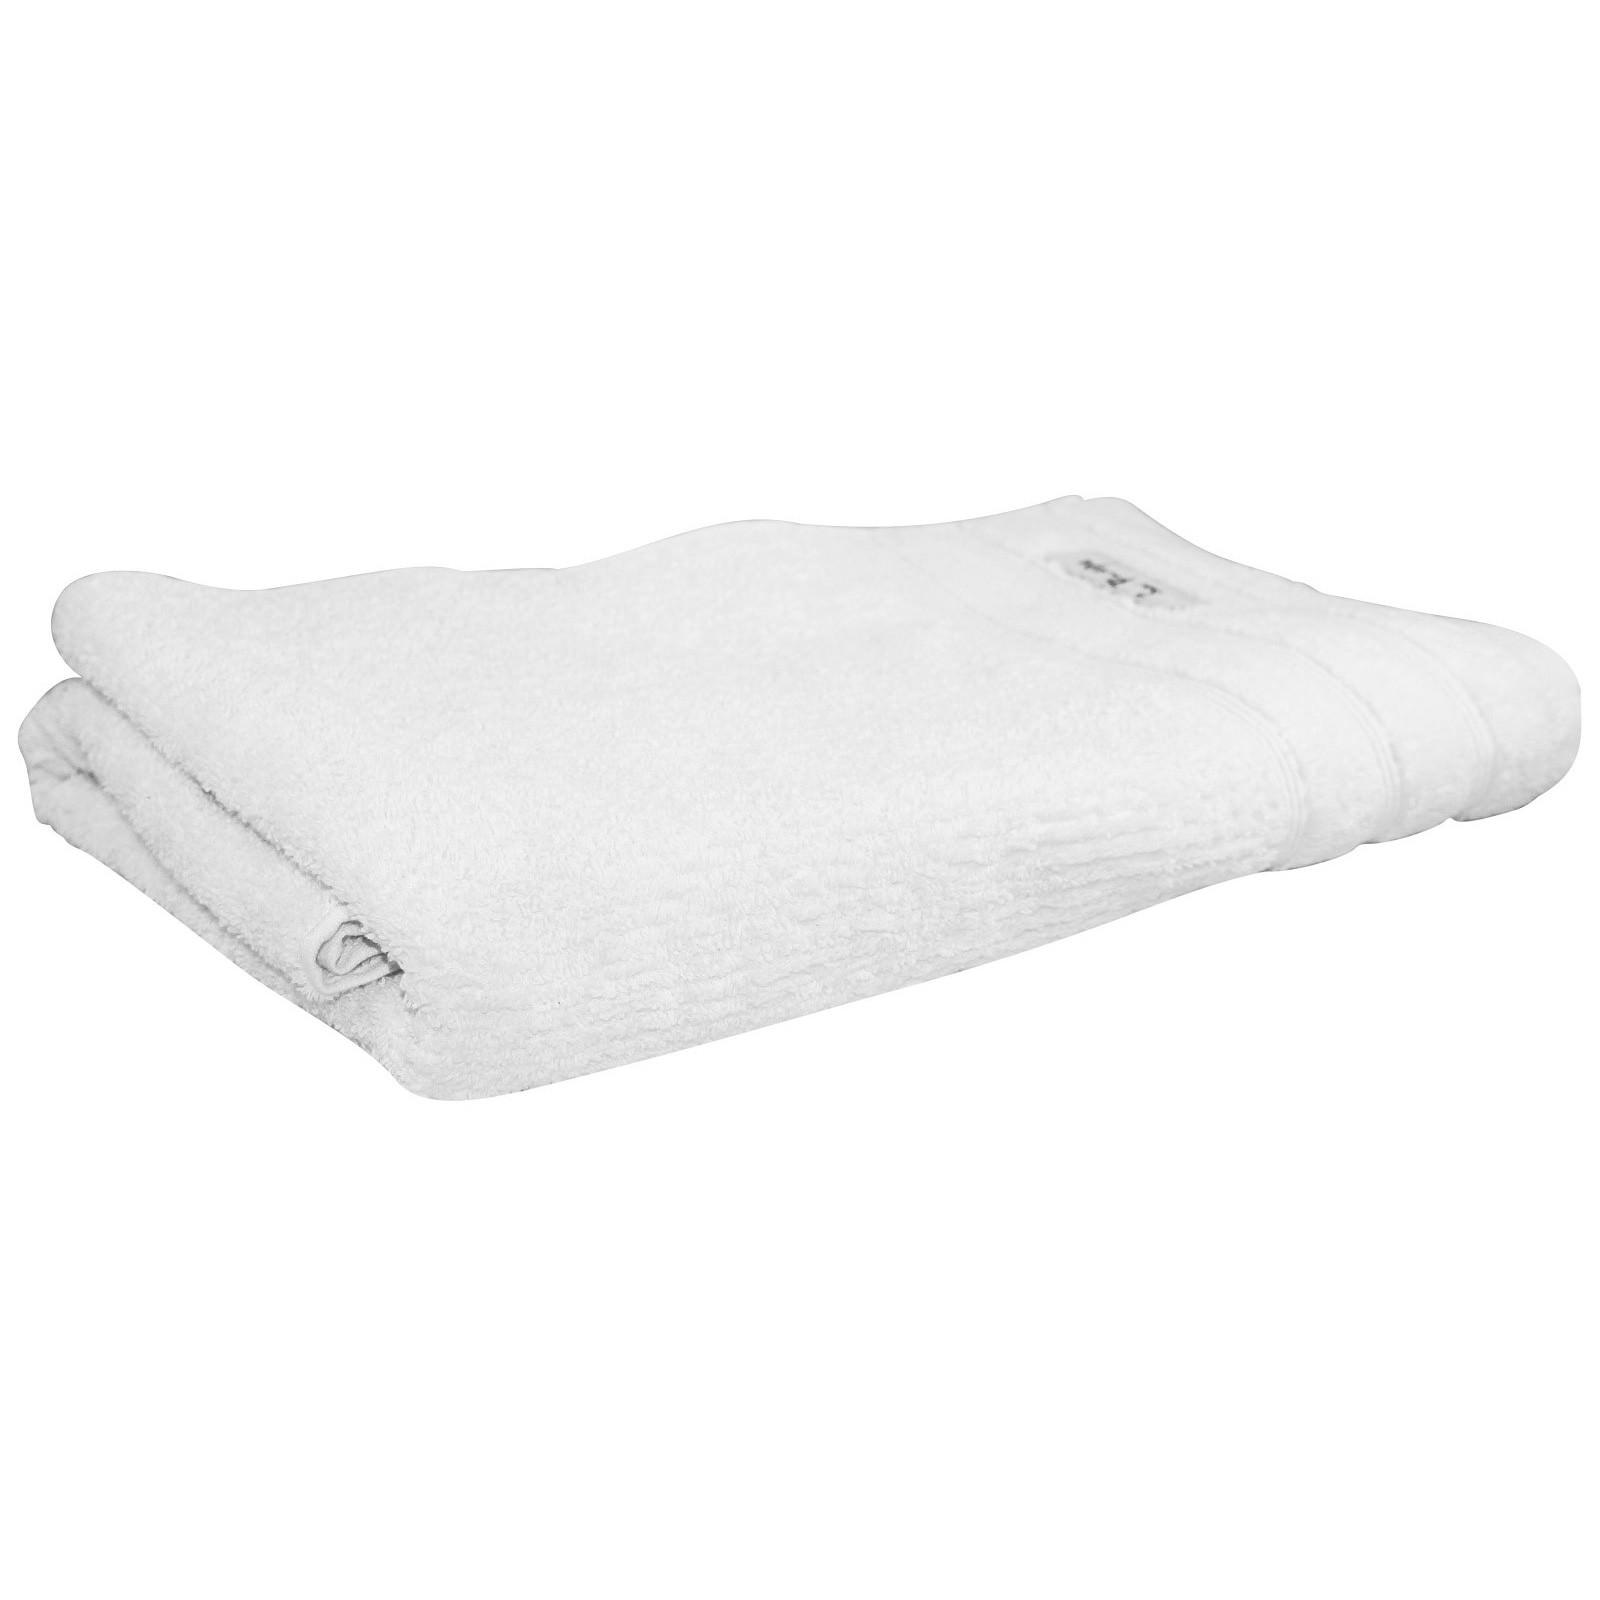 Bas Phillips Cairo Egyptian Cotton Bath Towel, White